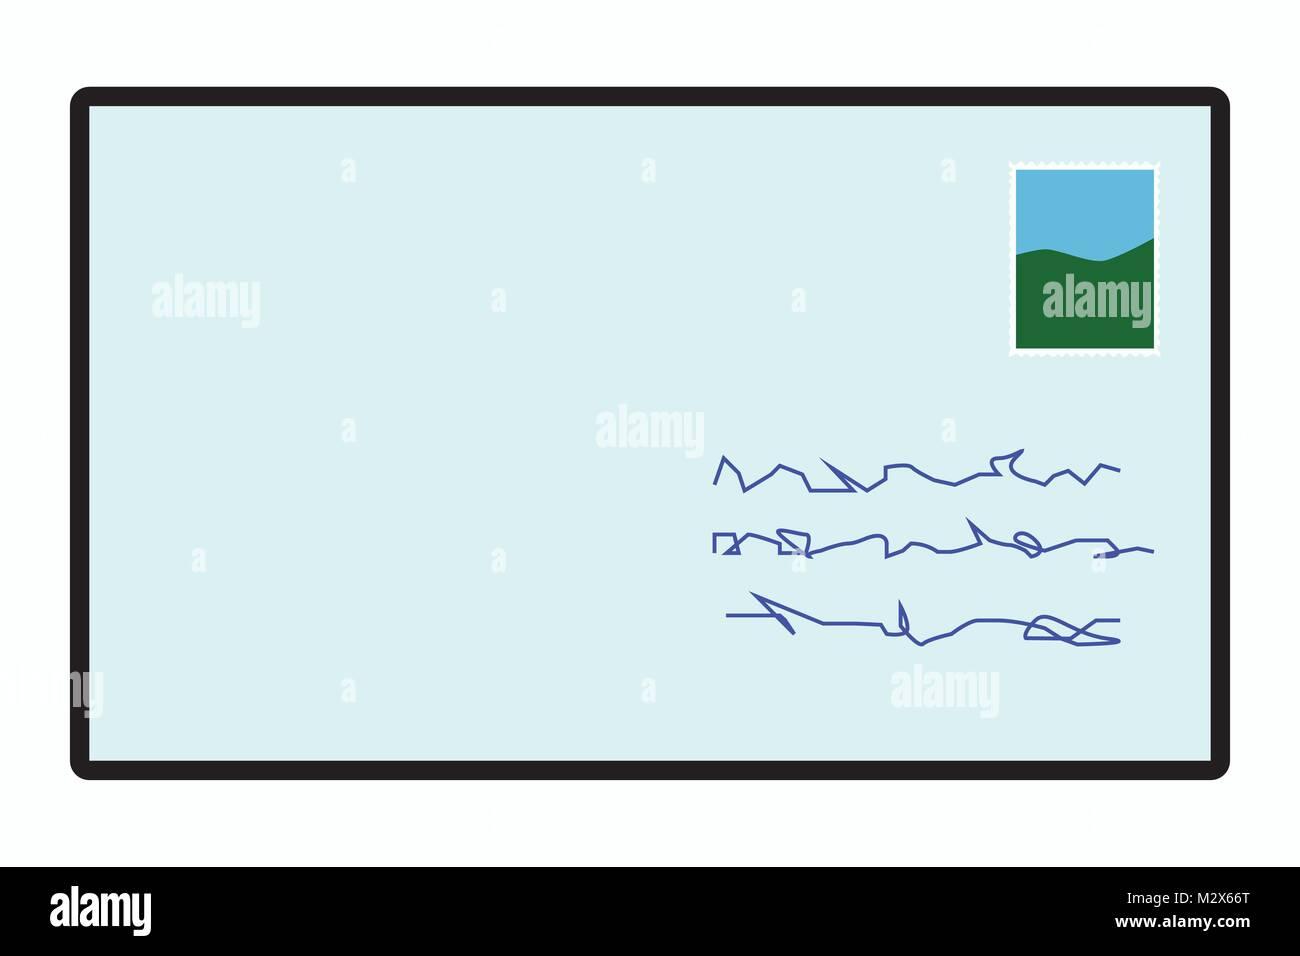 Symbol Mail Post Brief Symbol Illustration Der Umschlag Mit Dem